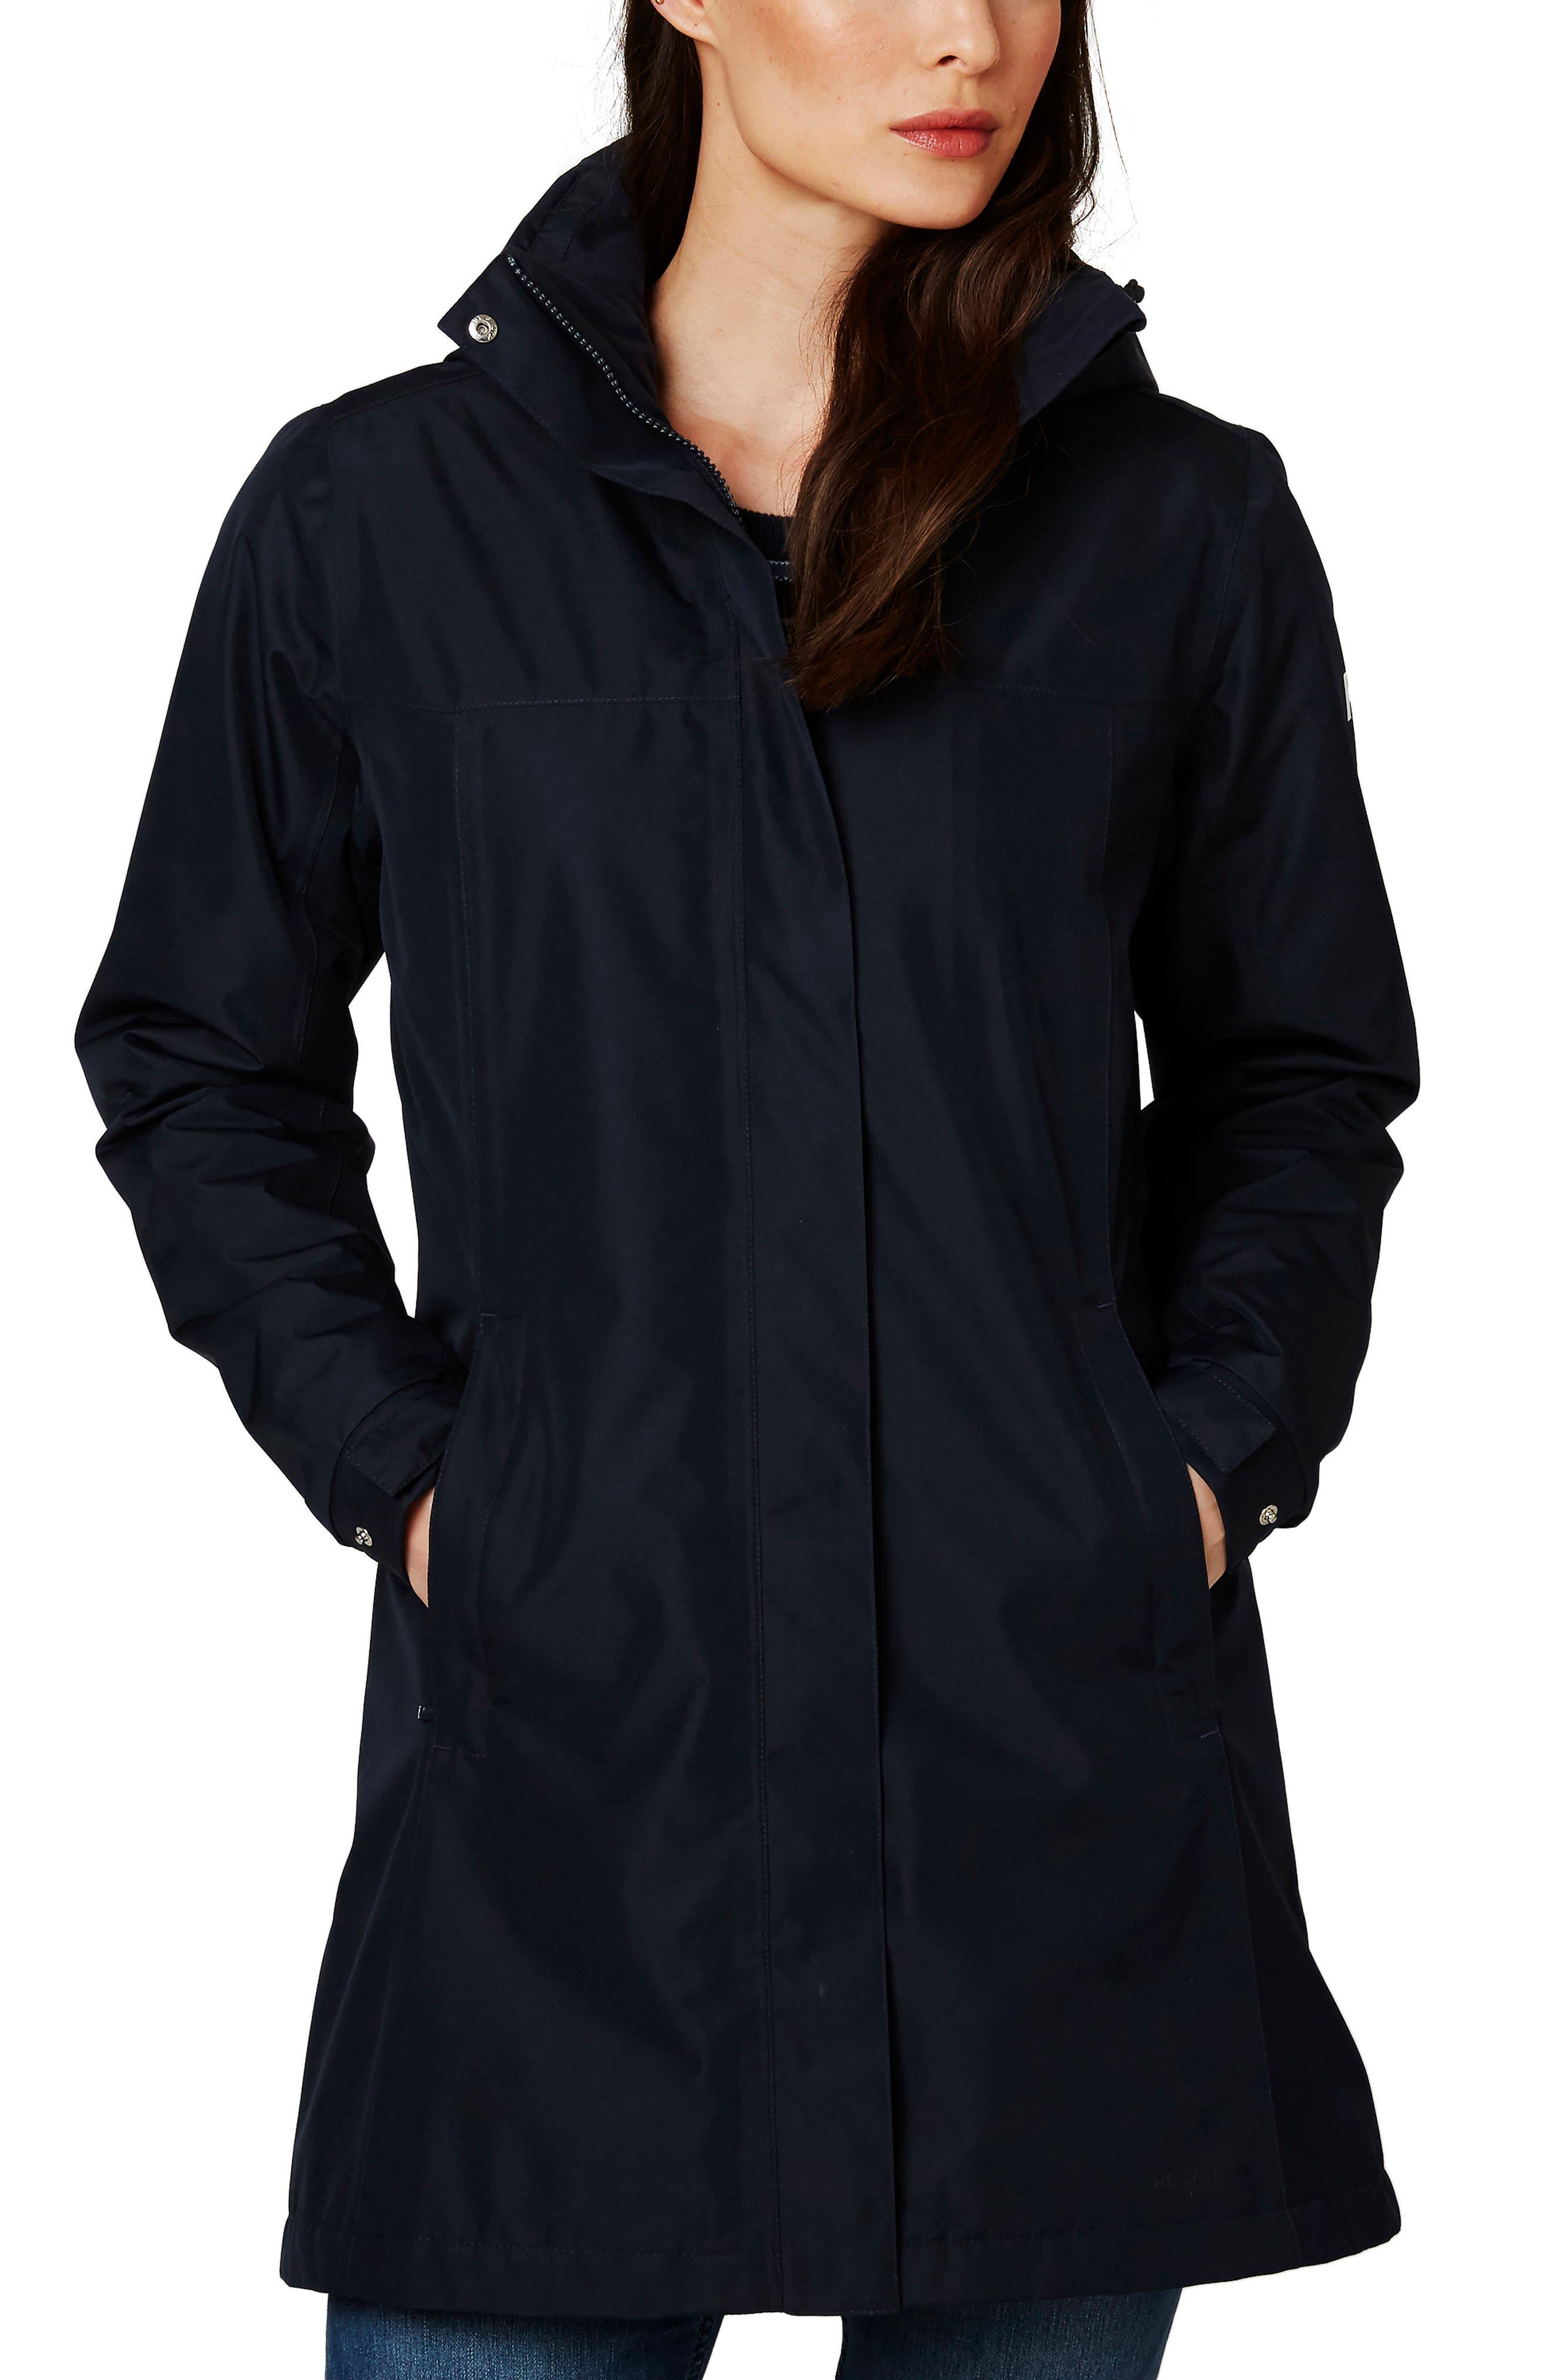 Aden Hooded Insulated Rain Jacket